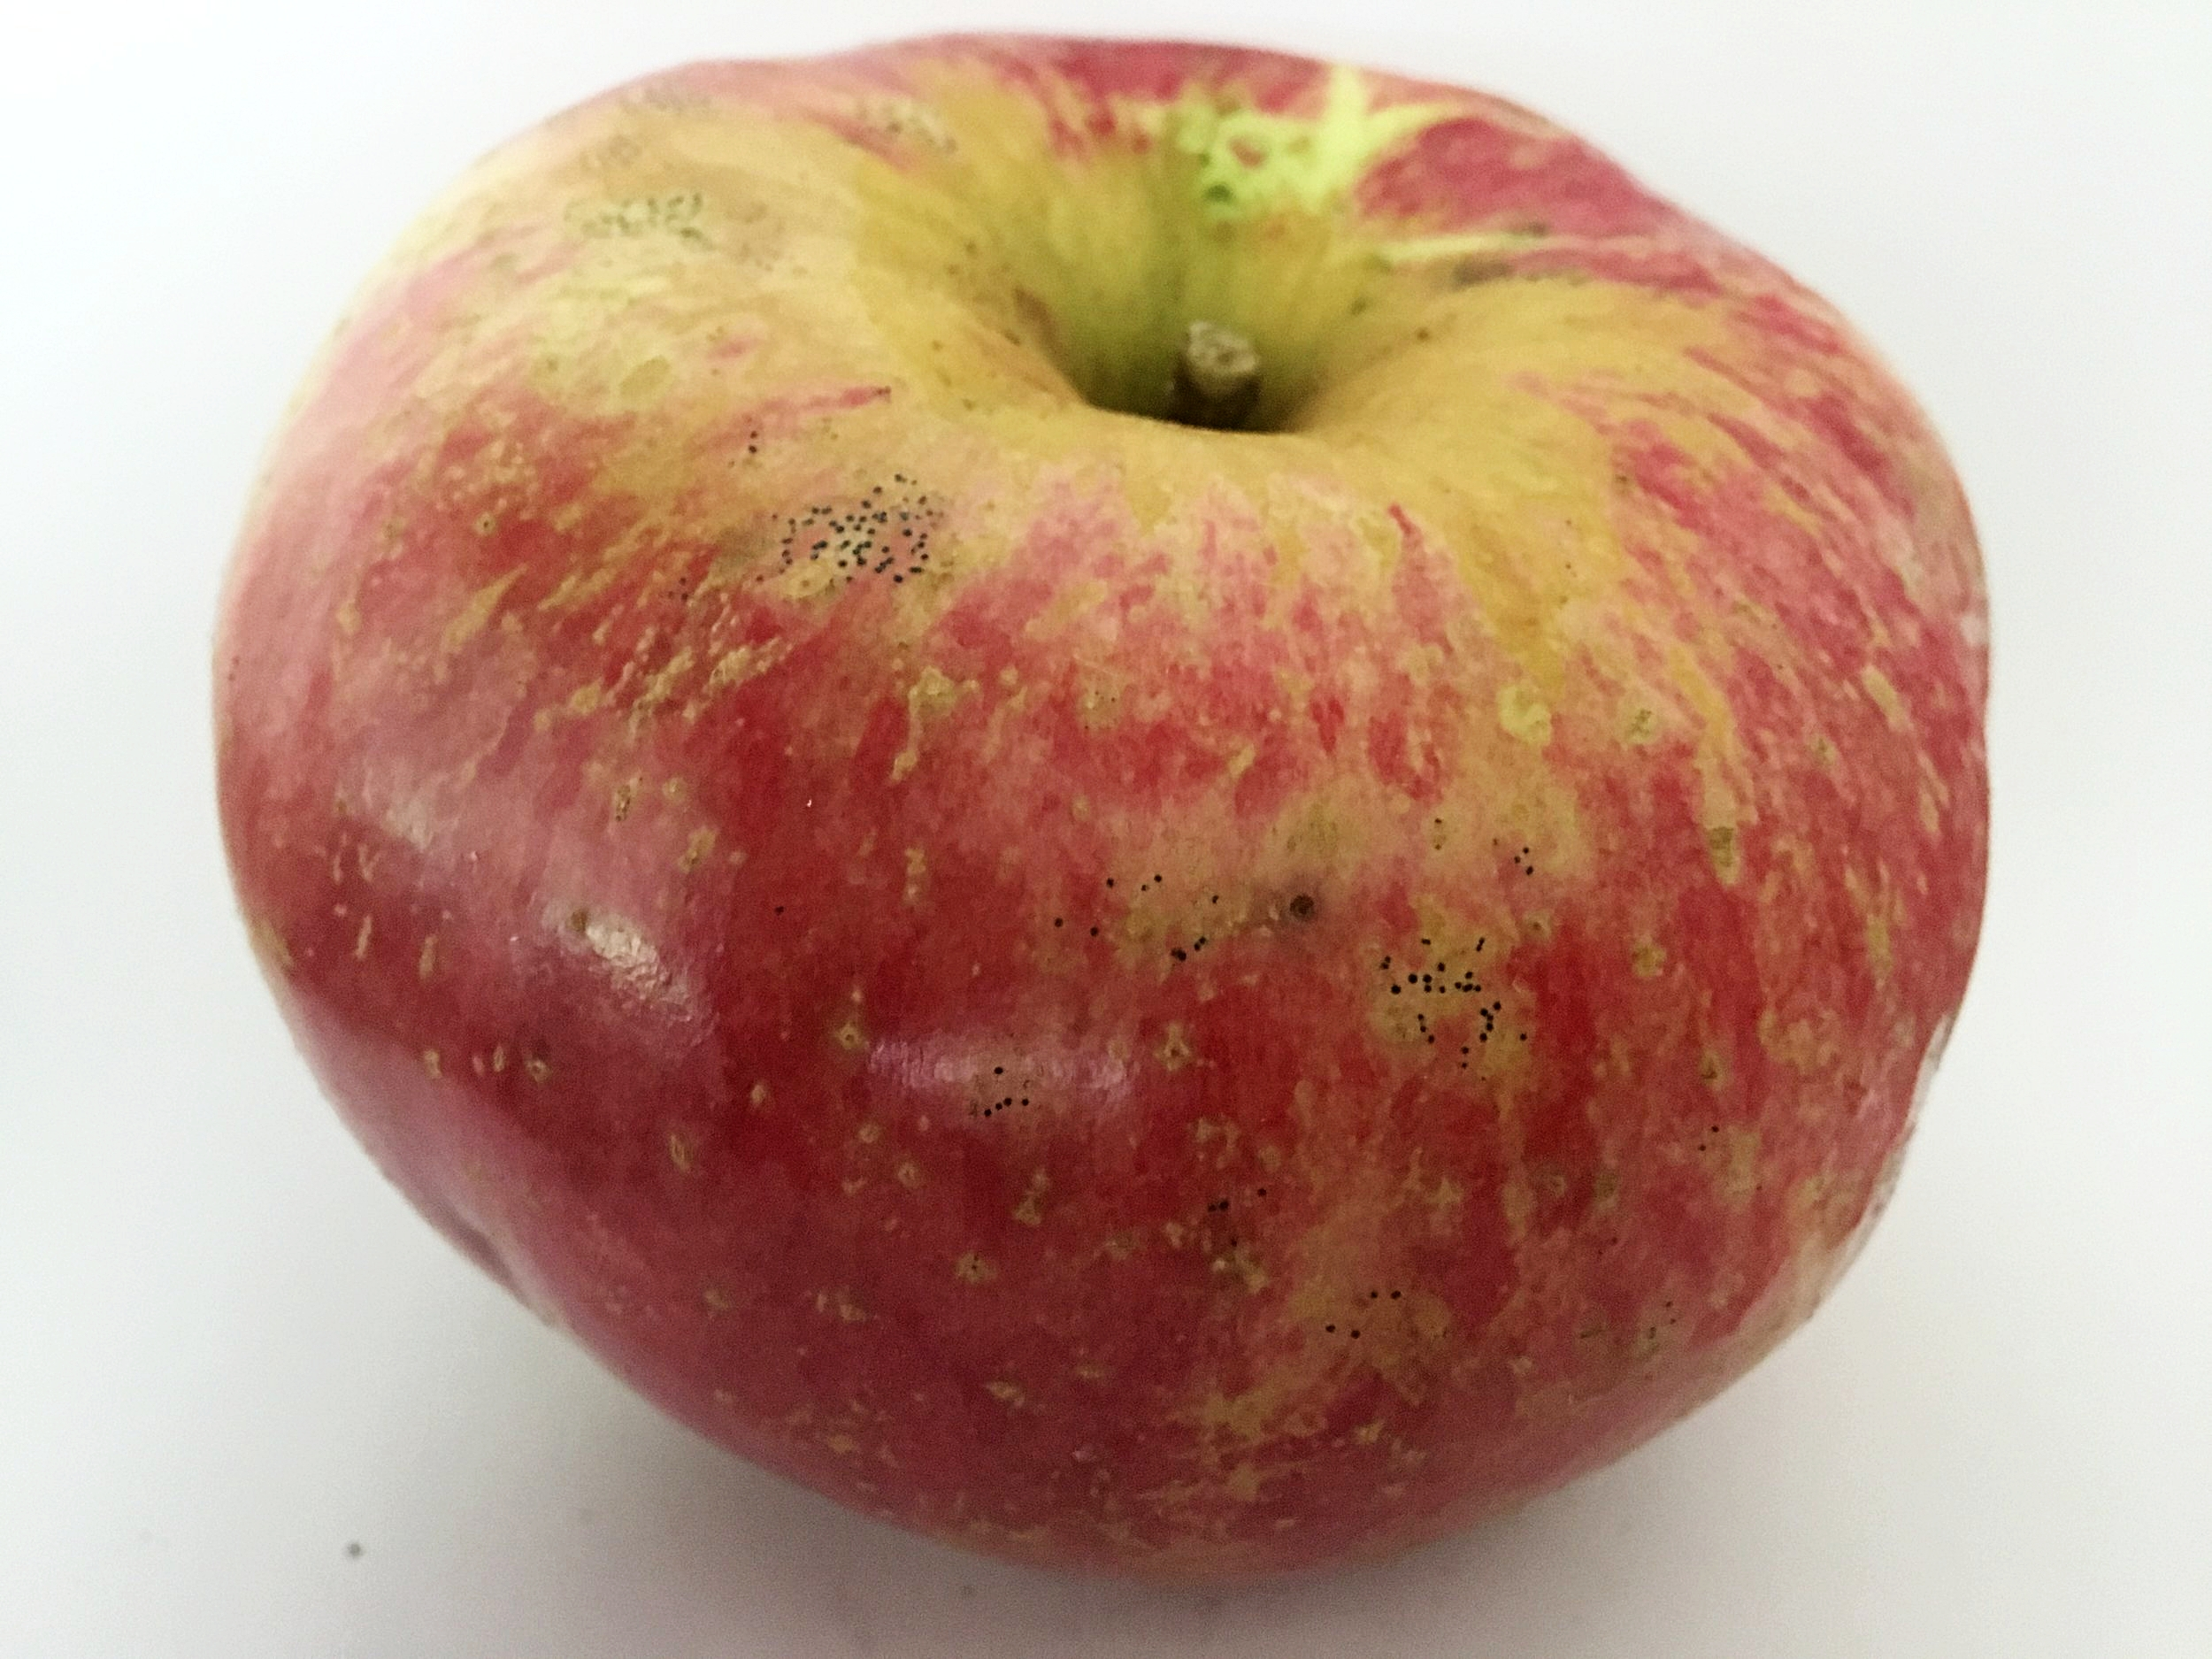 Wolf River Apple